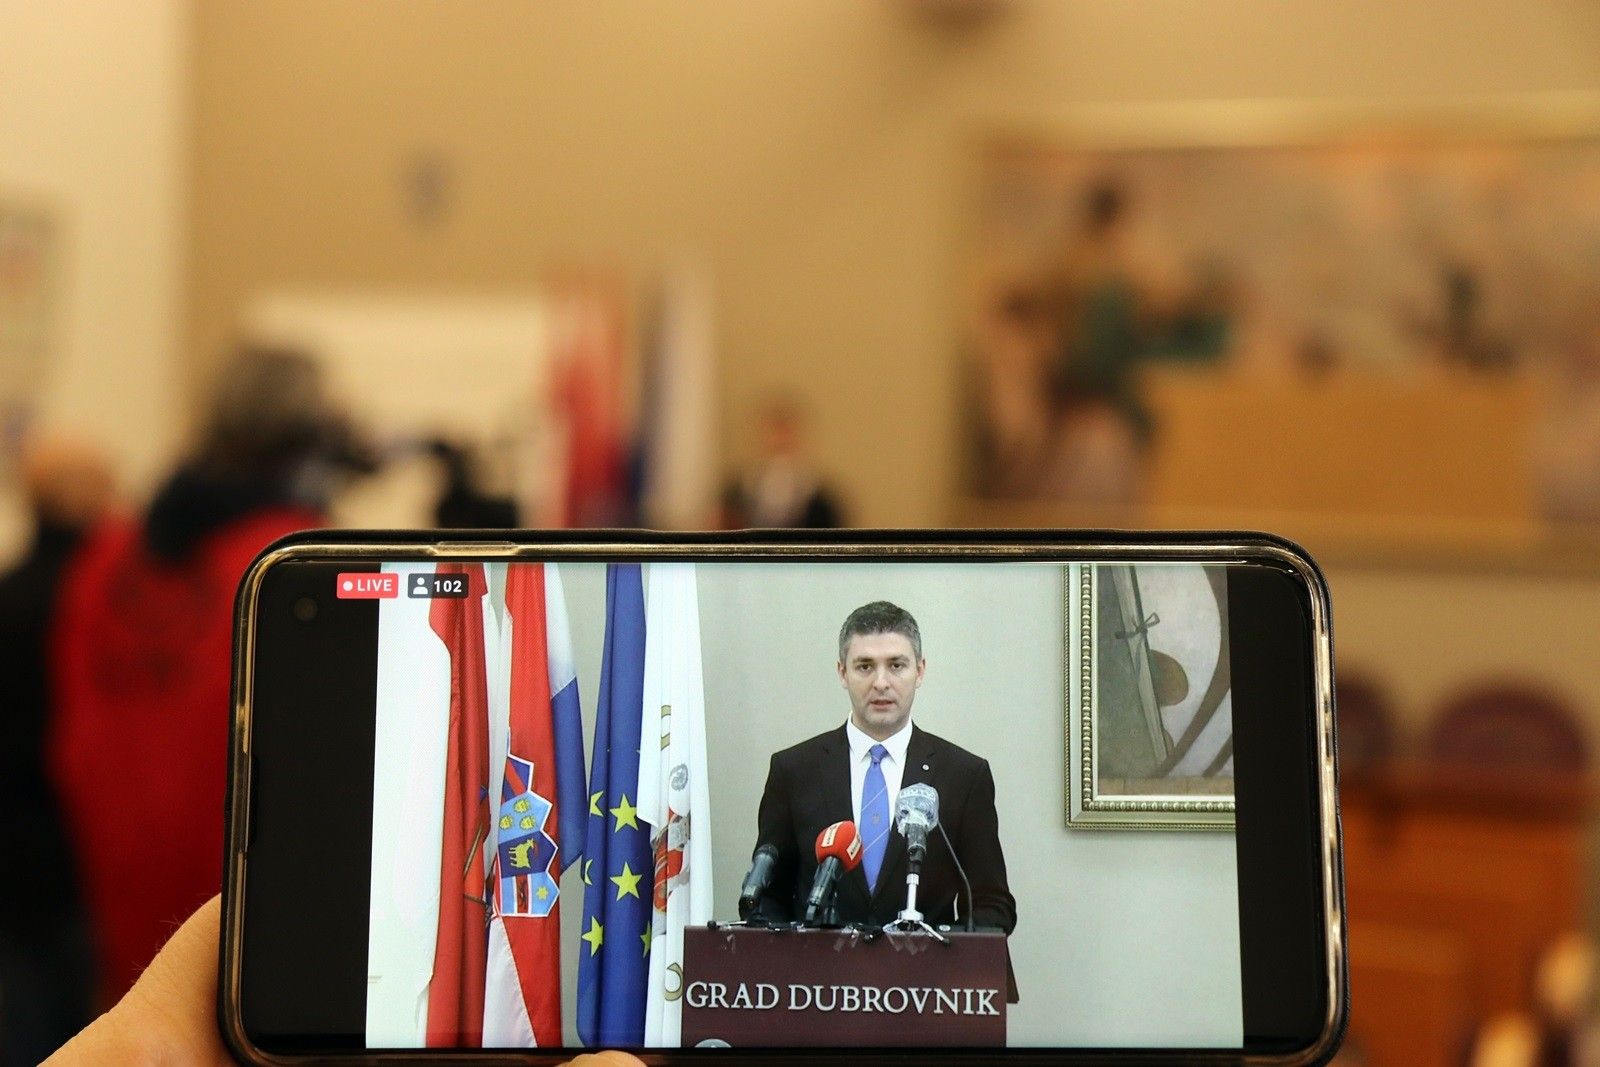 Gradonačelnik predstavio paket mjera za pomoć pri prevladavanju krize